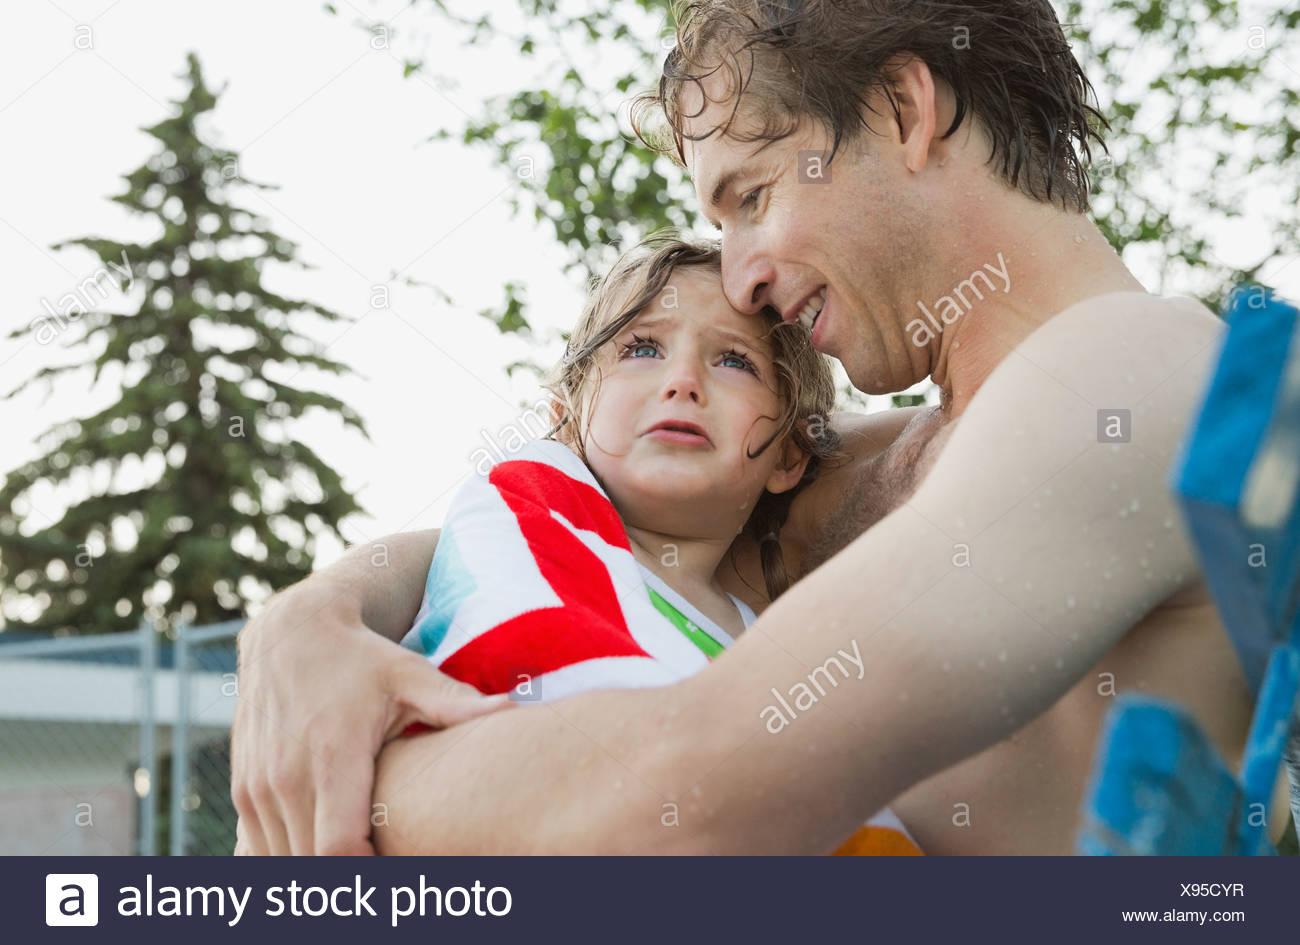 Hombre llorando consoladora hija en la piscina Imagen De Stock